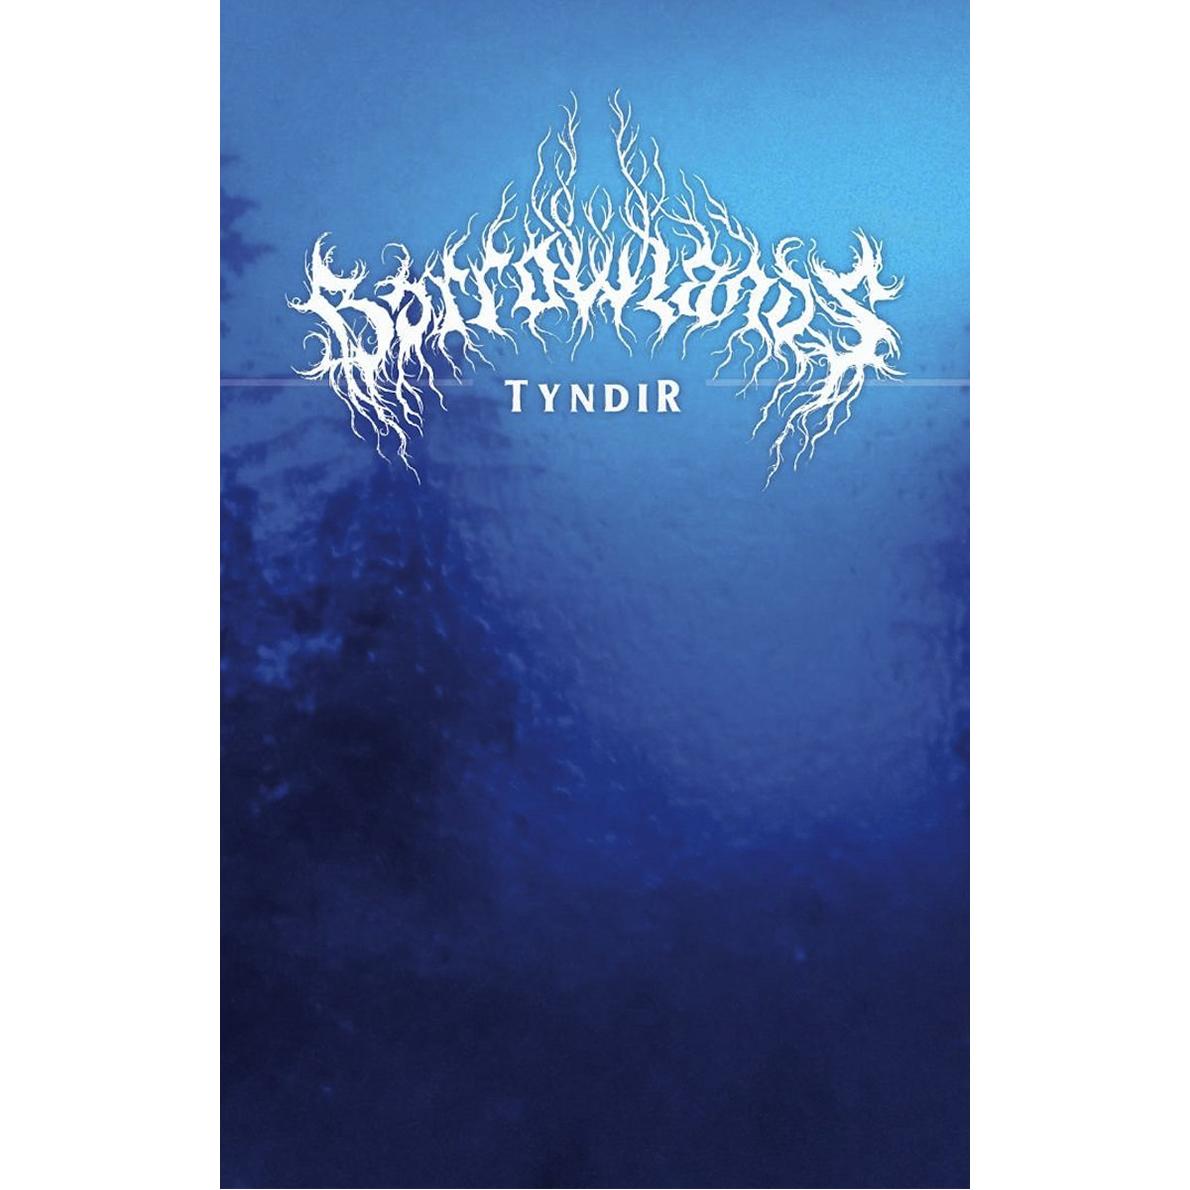 BARROWLANDS - Tyndir